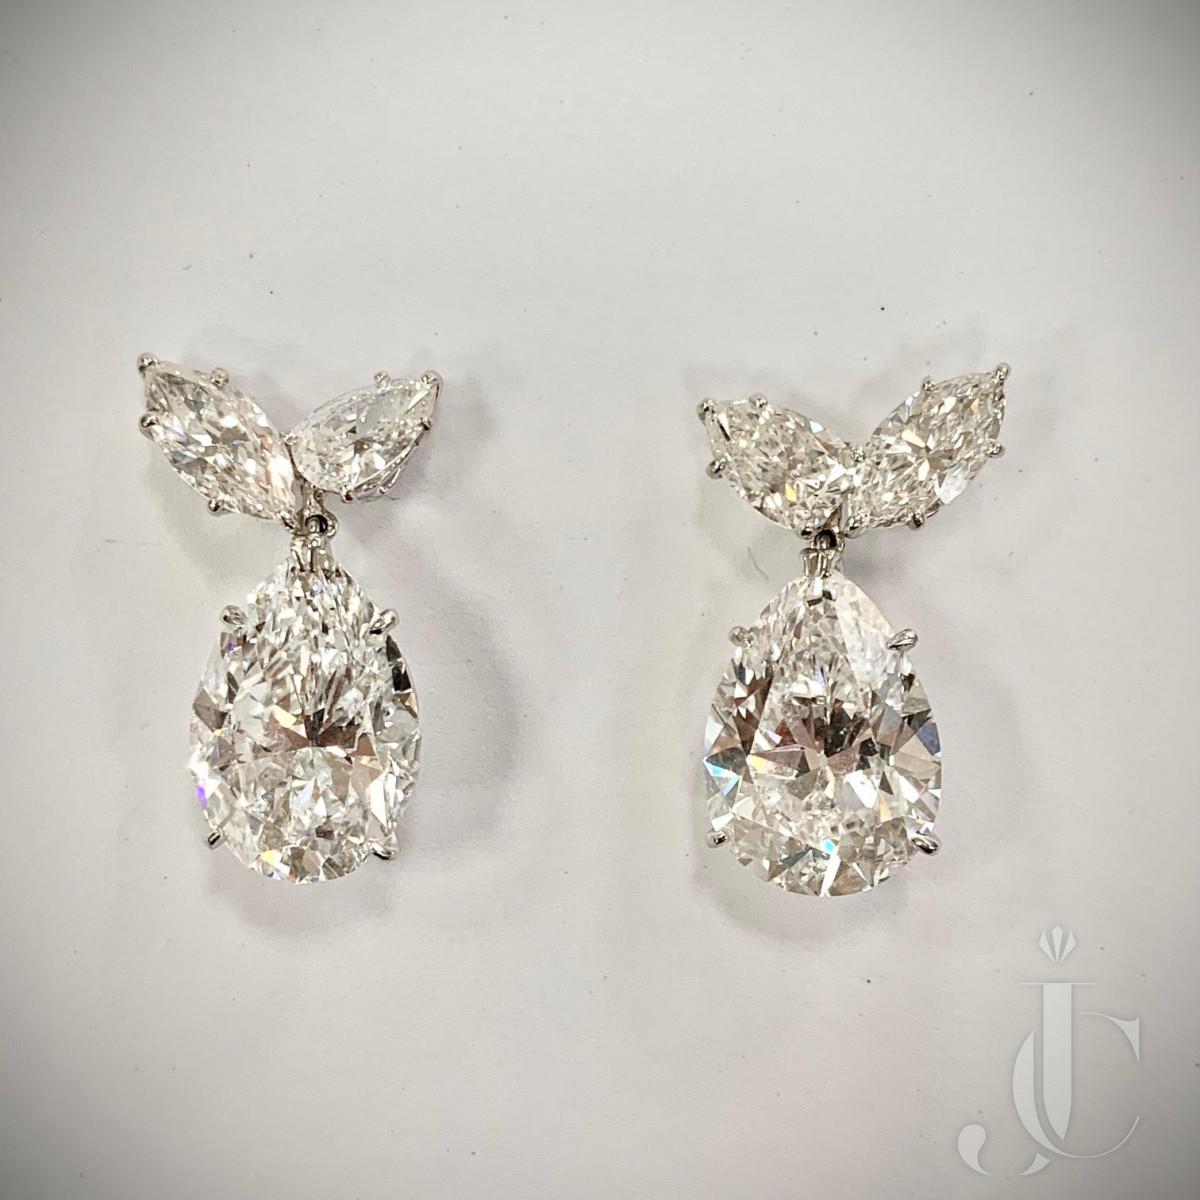 Pair of Harry Winston Pear Shape Diamond Earring Drops DIF, Type IIA